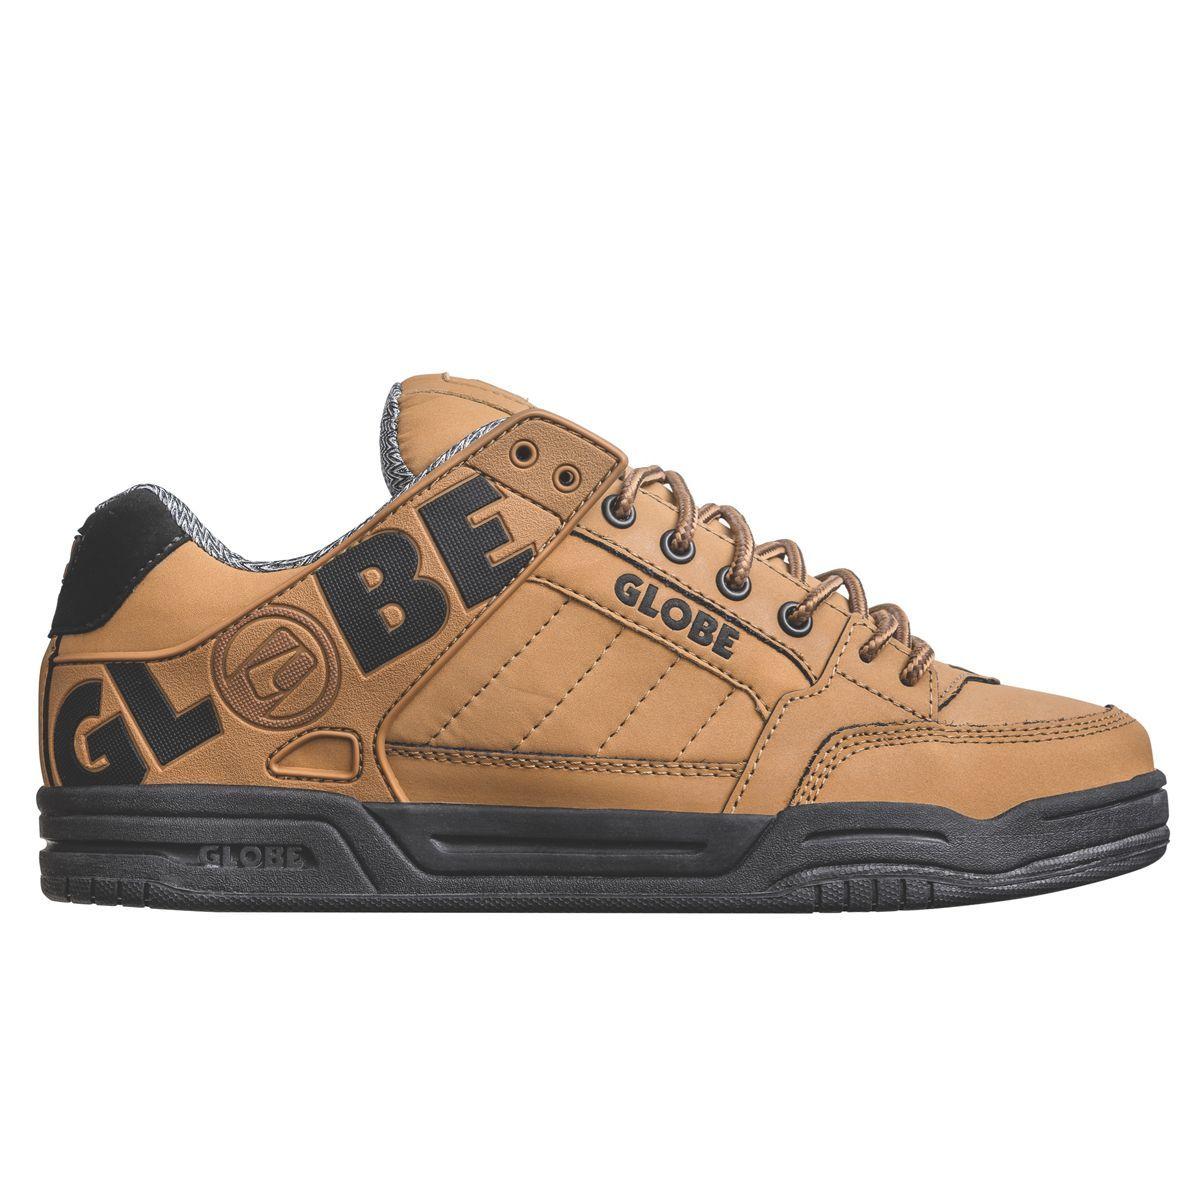 Chaussures de skateboard homme Globe Tilt